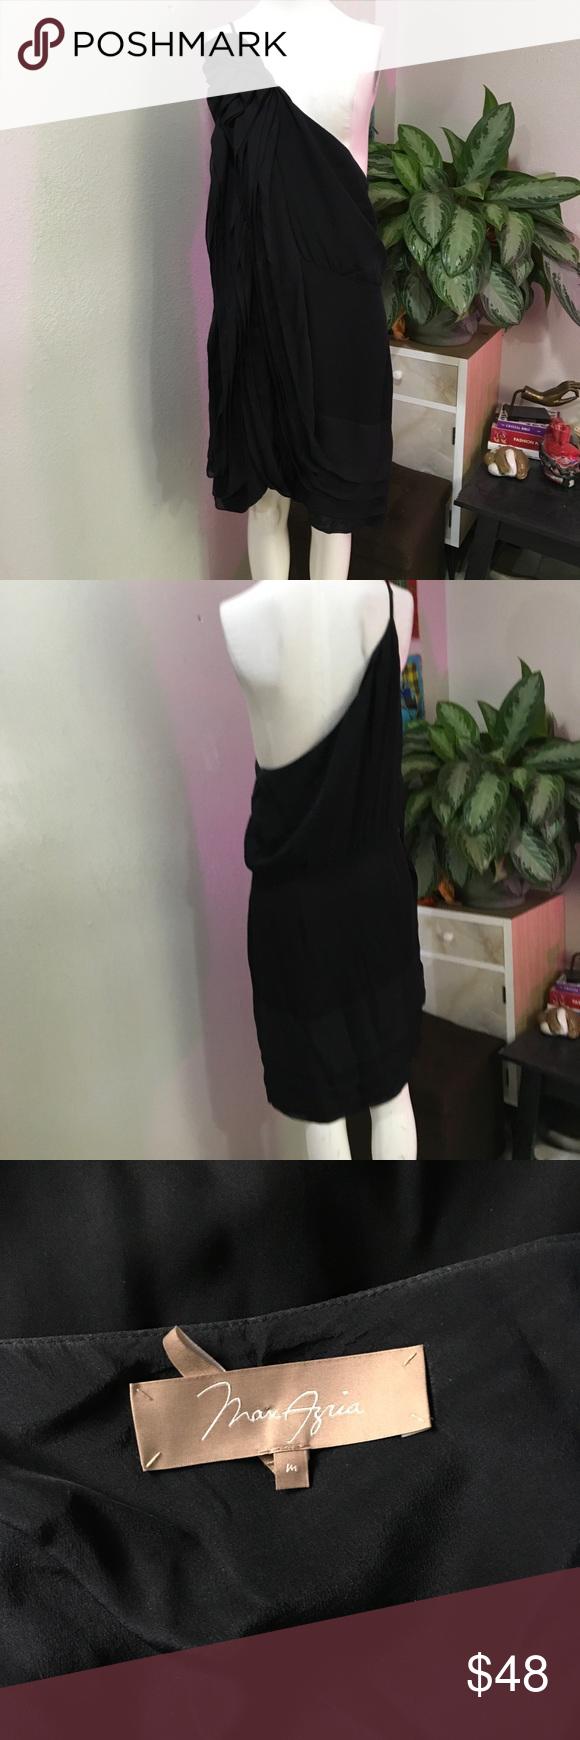 MAXAZRIA M SILK BLACK ONE SLEEVE RUFFLE MINI DRESS Beautiful dress by BCBG MAXAZRIA BCBGMaxAzria Dresses